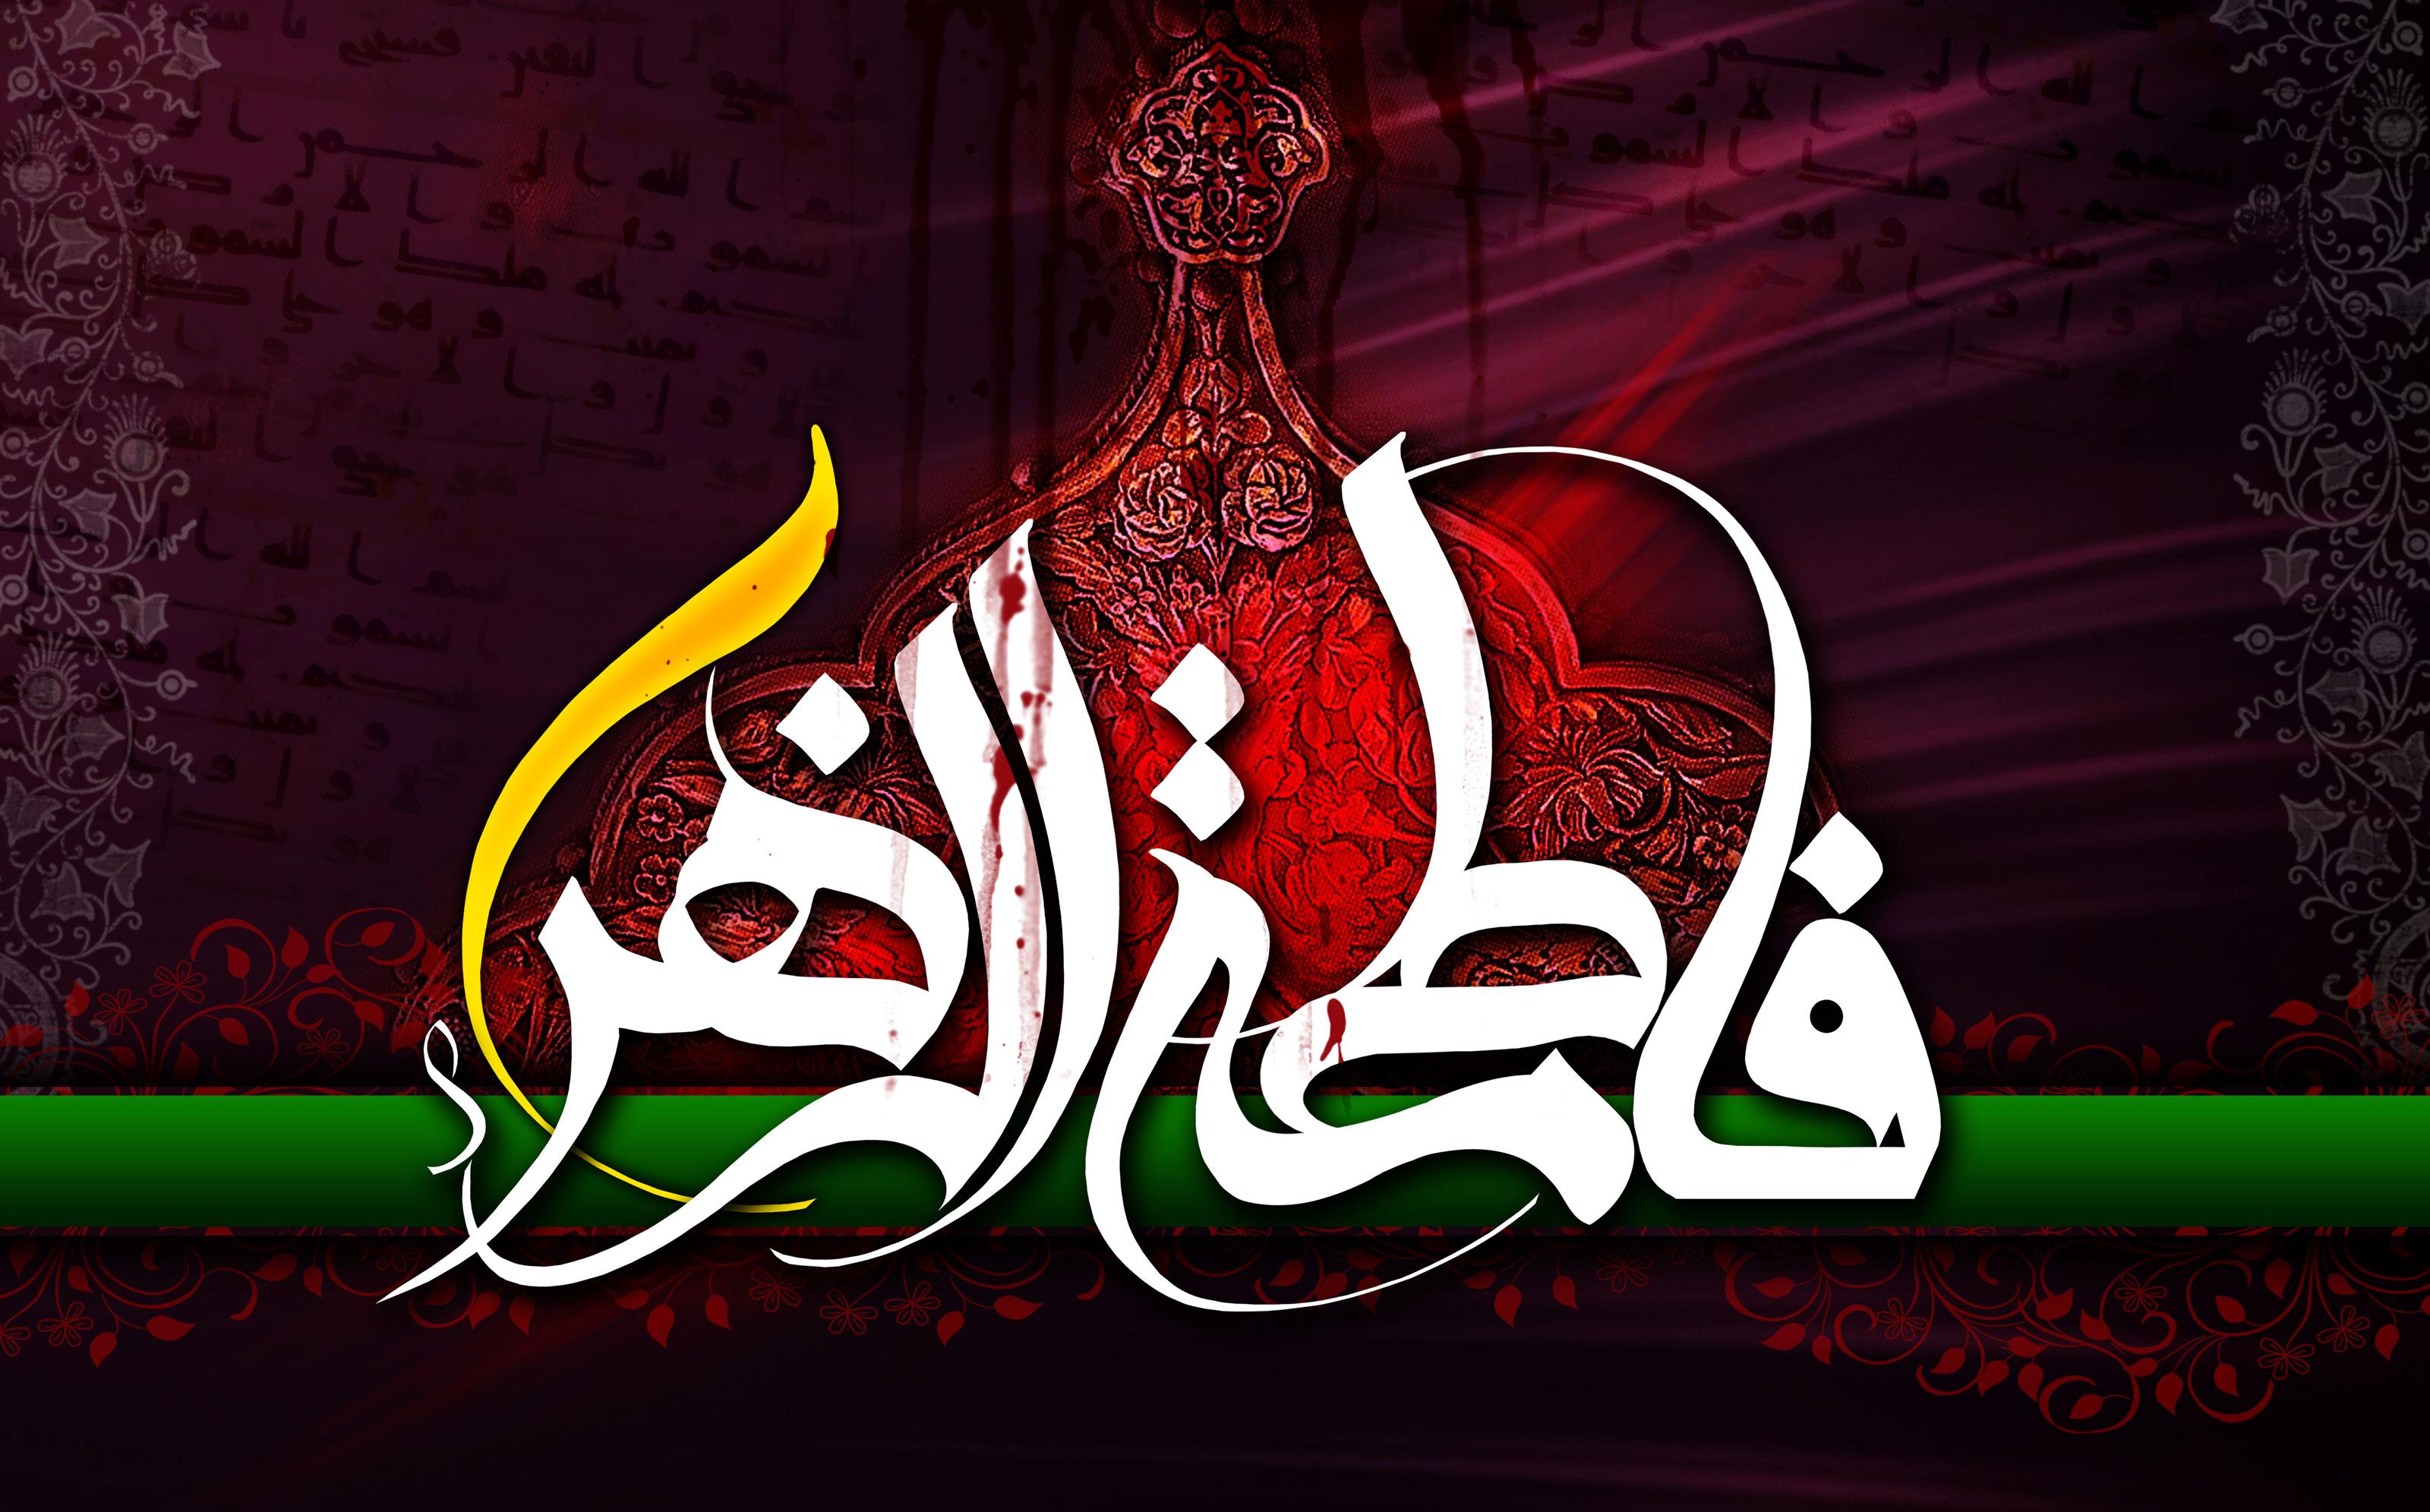 .: شهادت مظلومانه حضرت فاطمه الزهرا ، صدیقه الکبری تسلیت باد :.